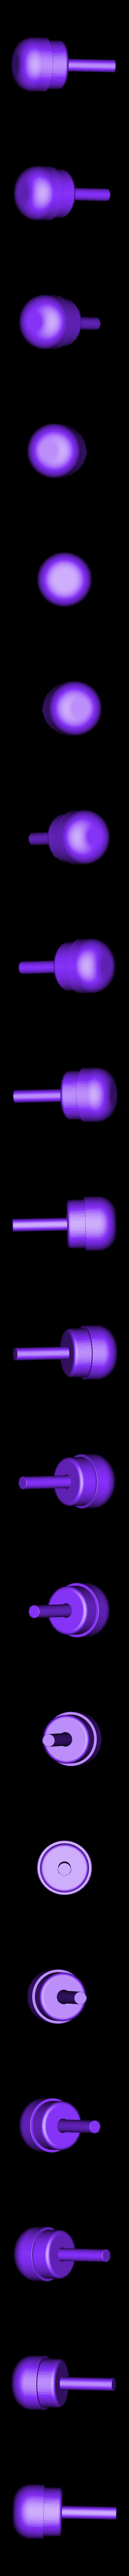 ff - ff12-1.STL Download STL file Folding Table Fan • 3D printer object, Dekro